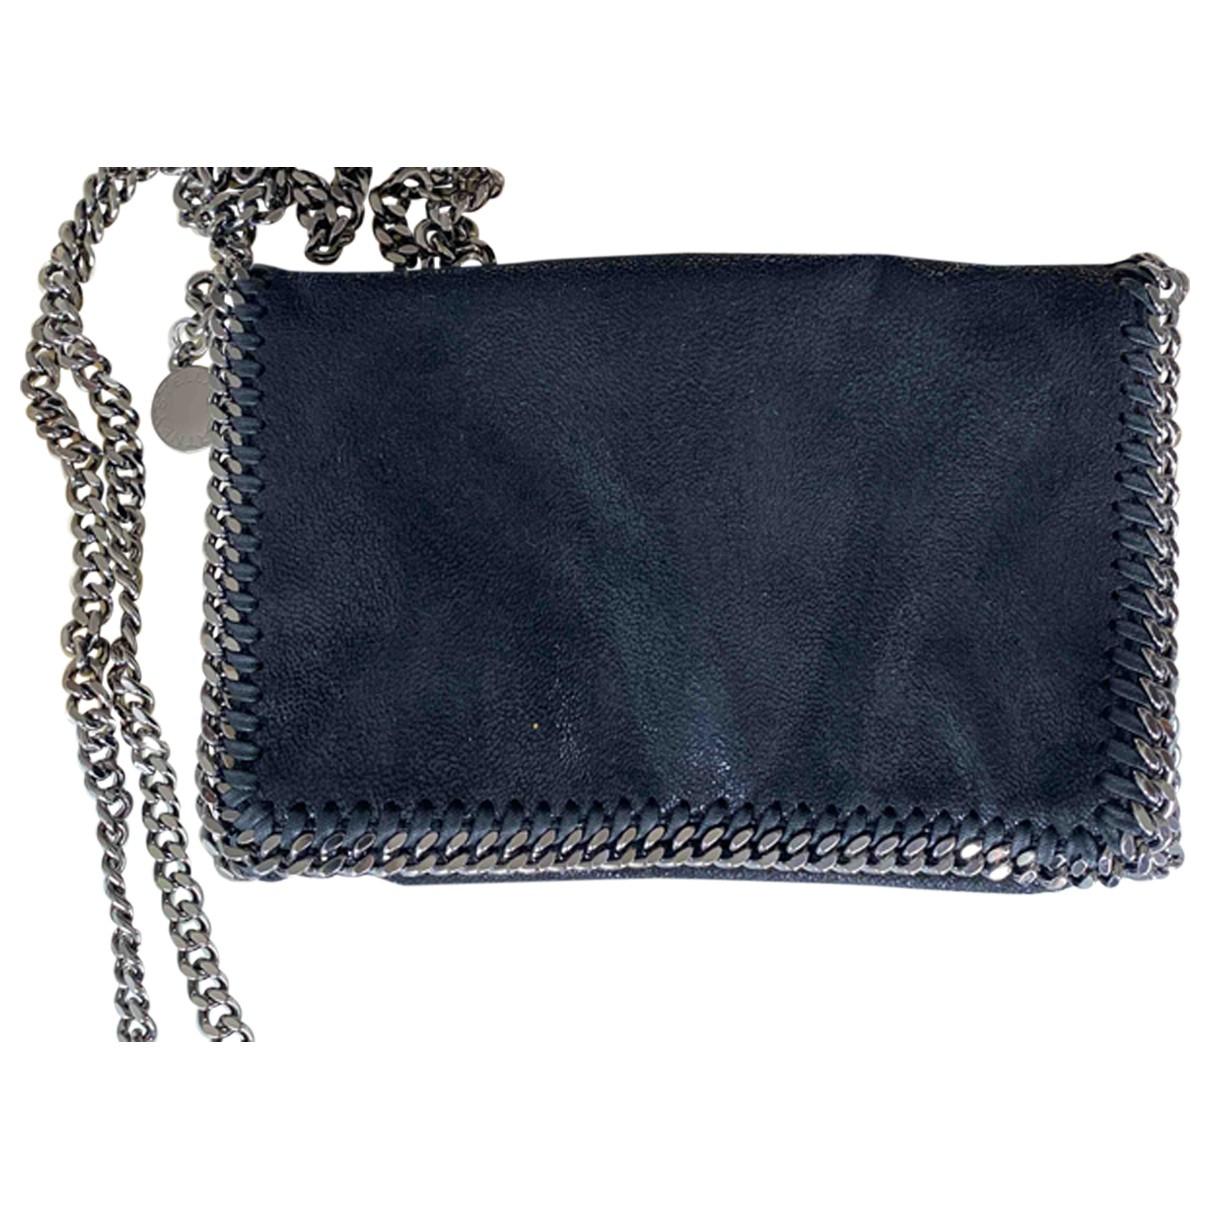 Stella Mccartney N Black Leather handbag for Women N